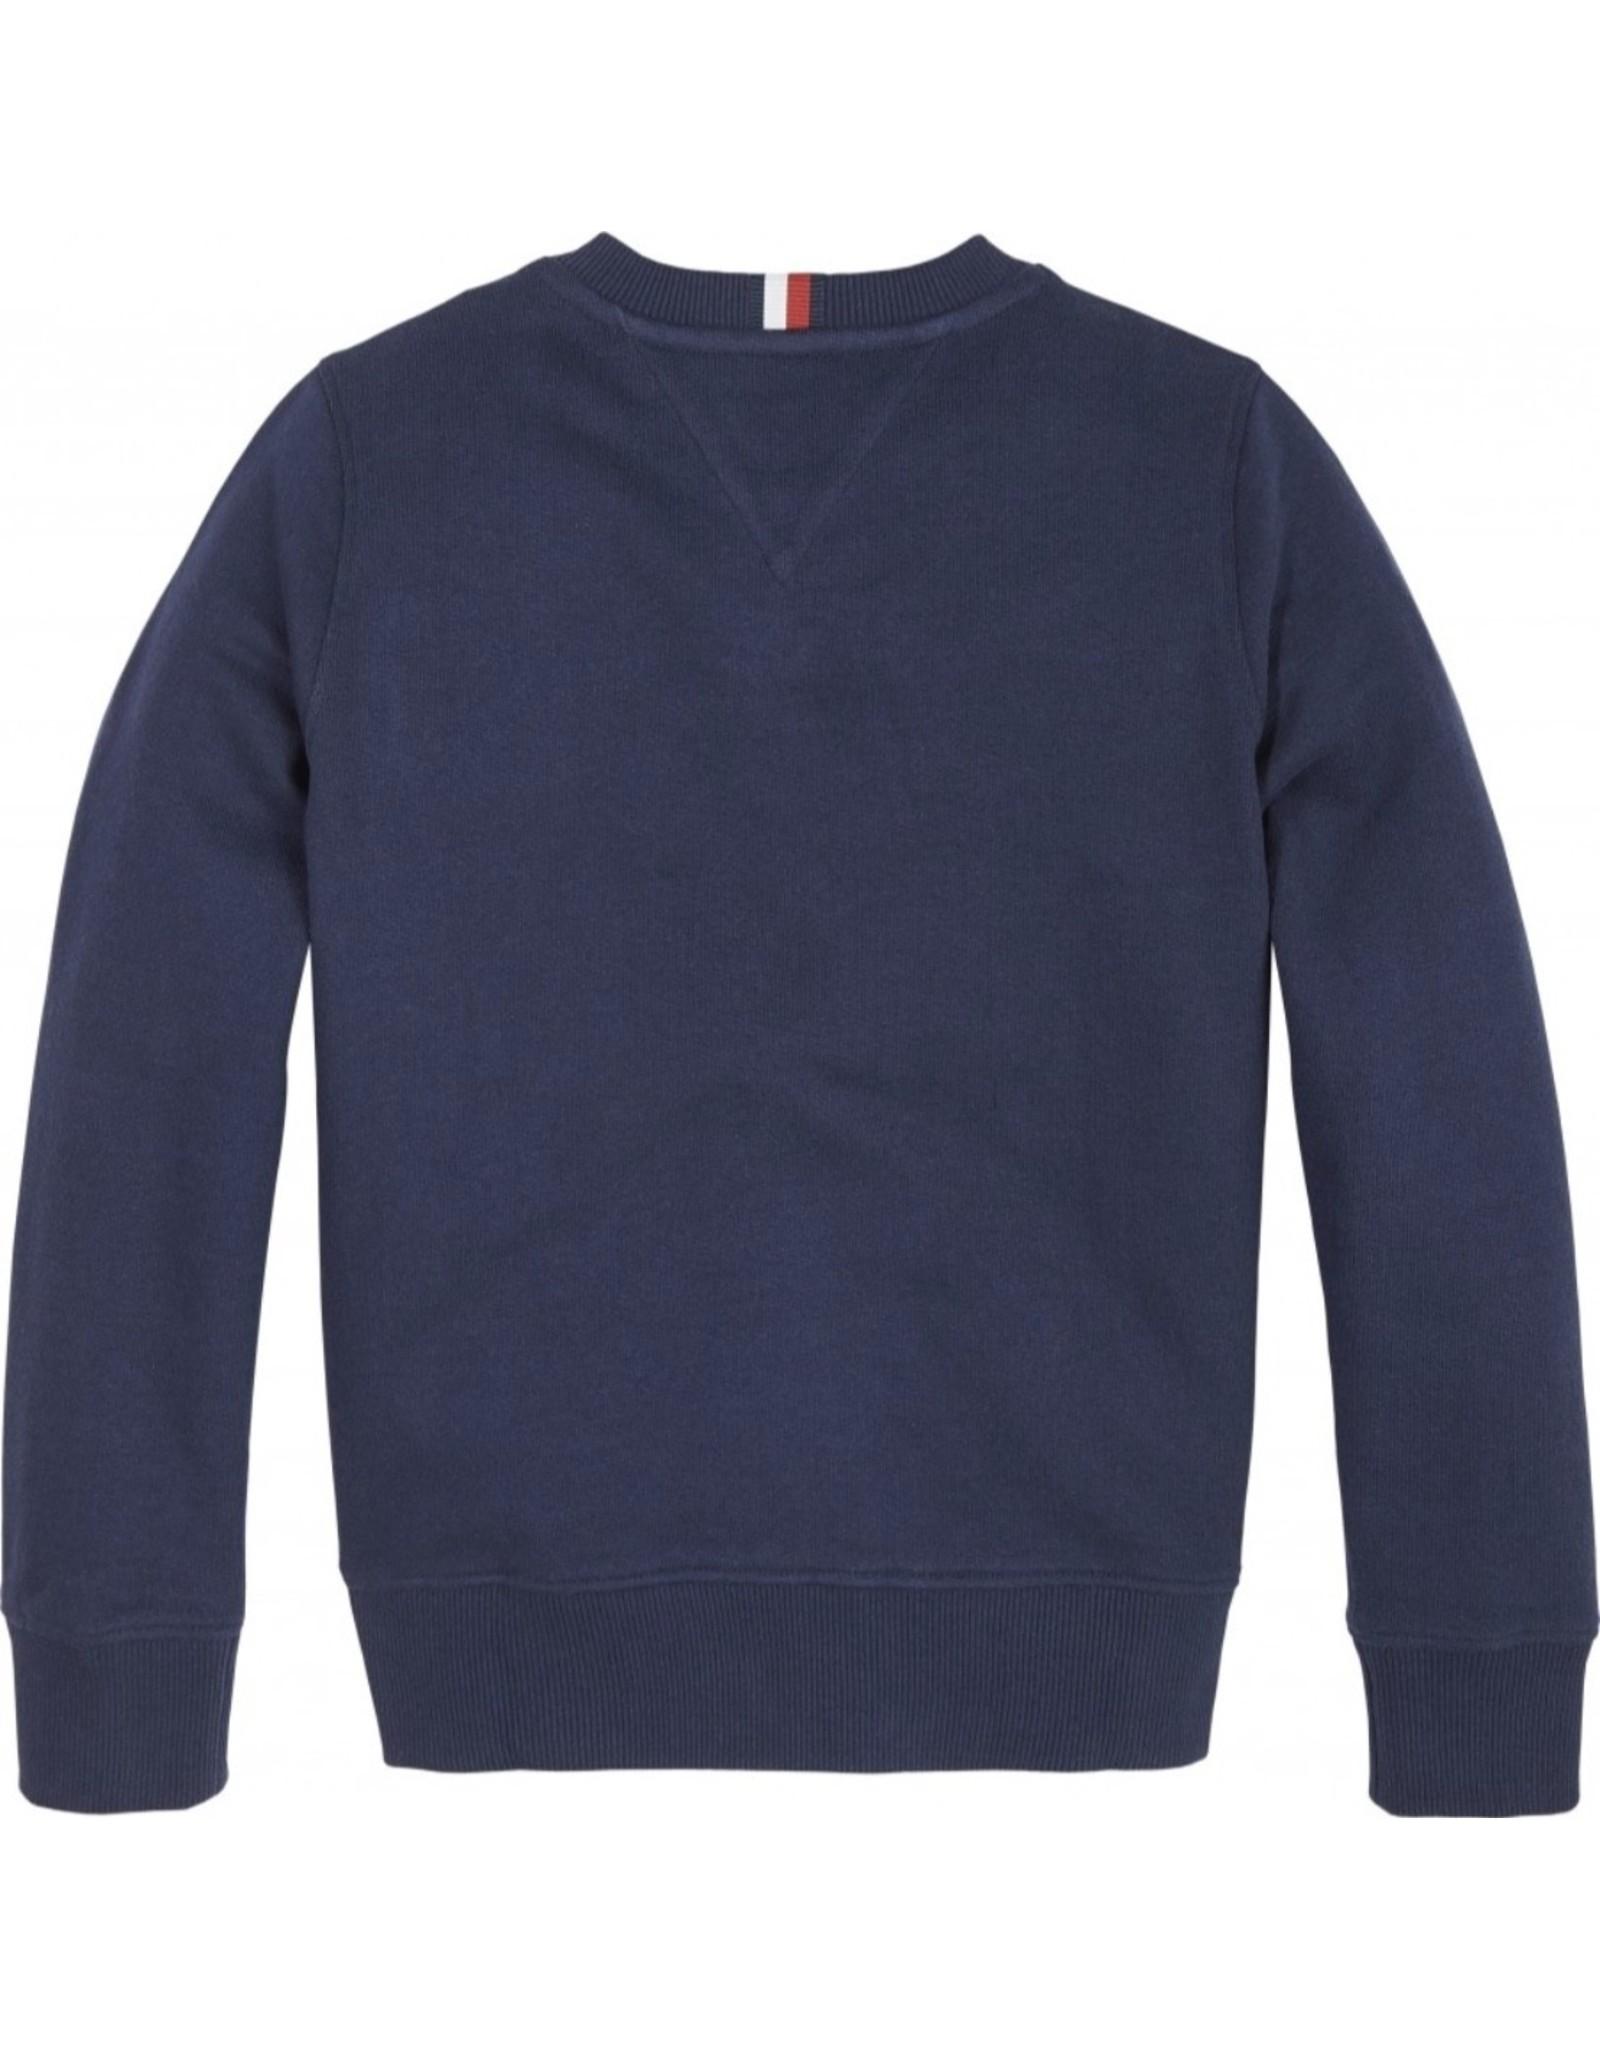 Tommy Hilfiger 5474 Sweater